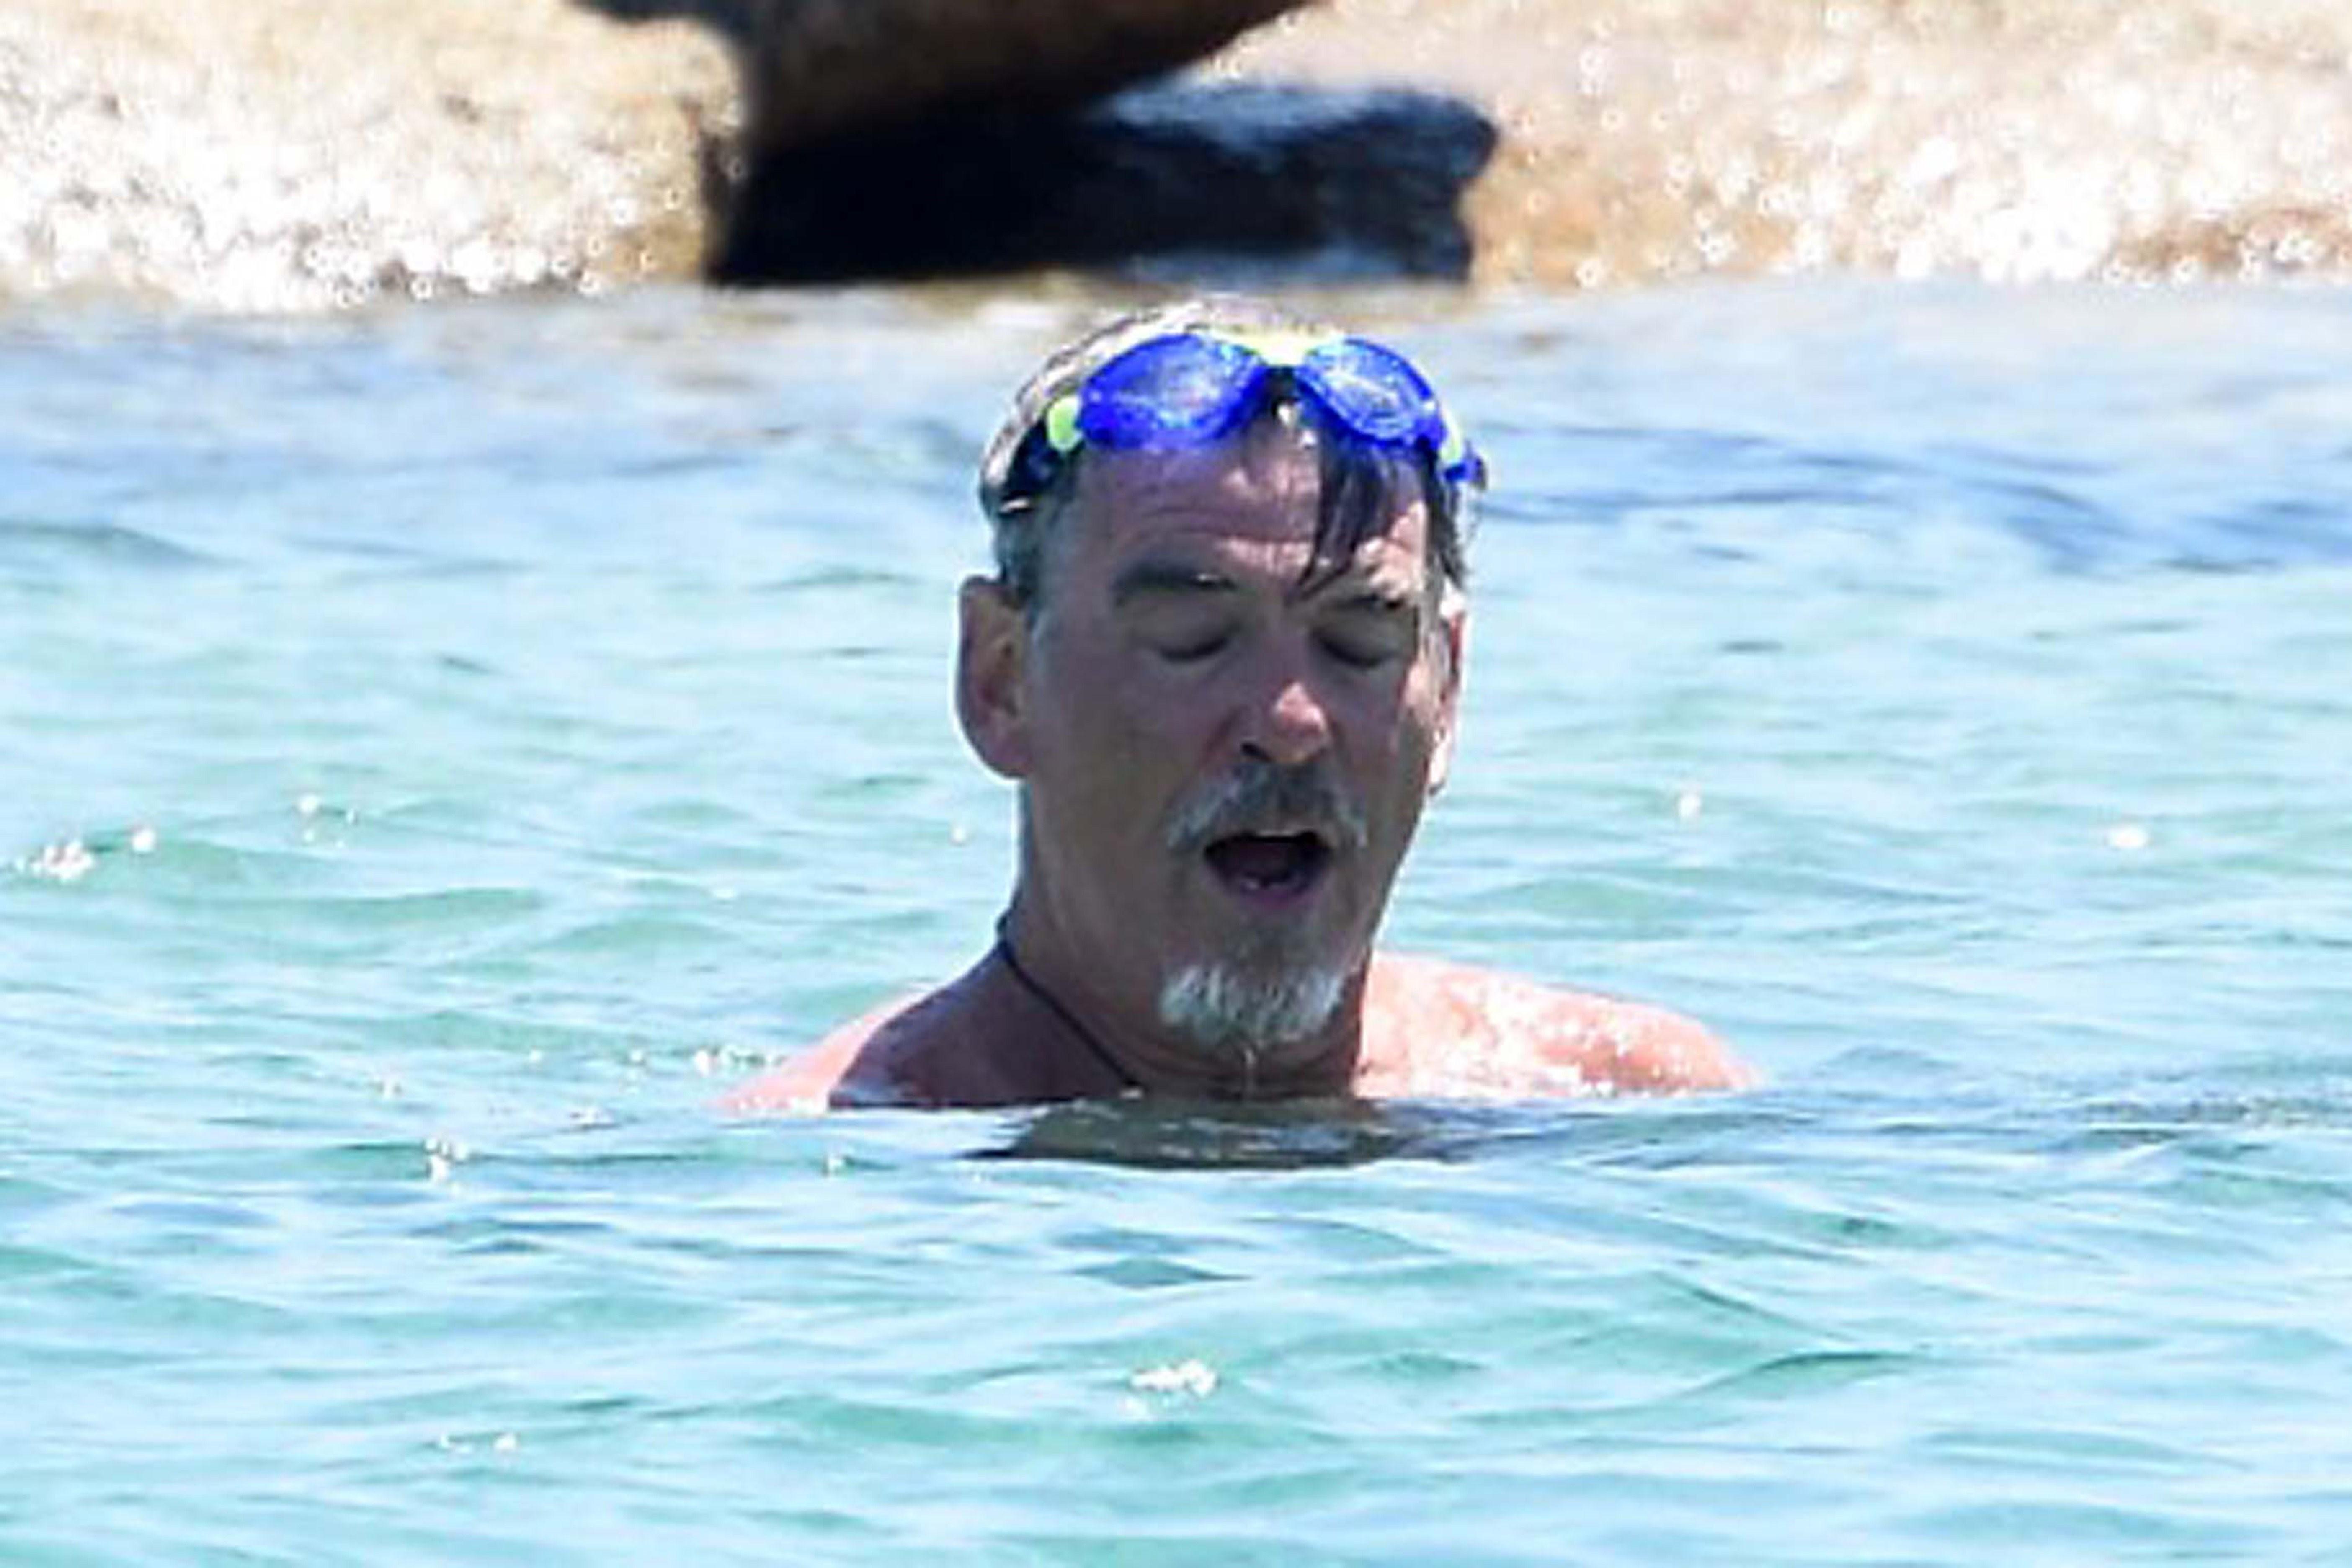 Pierce Brosnan  swims in the ocean in Italy on June 14, 2017.